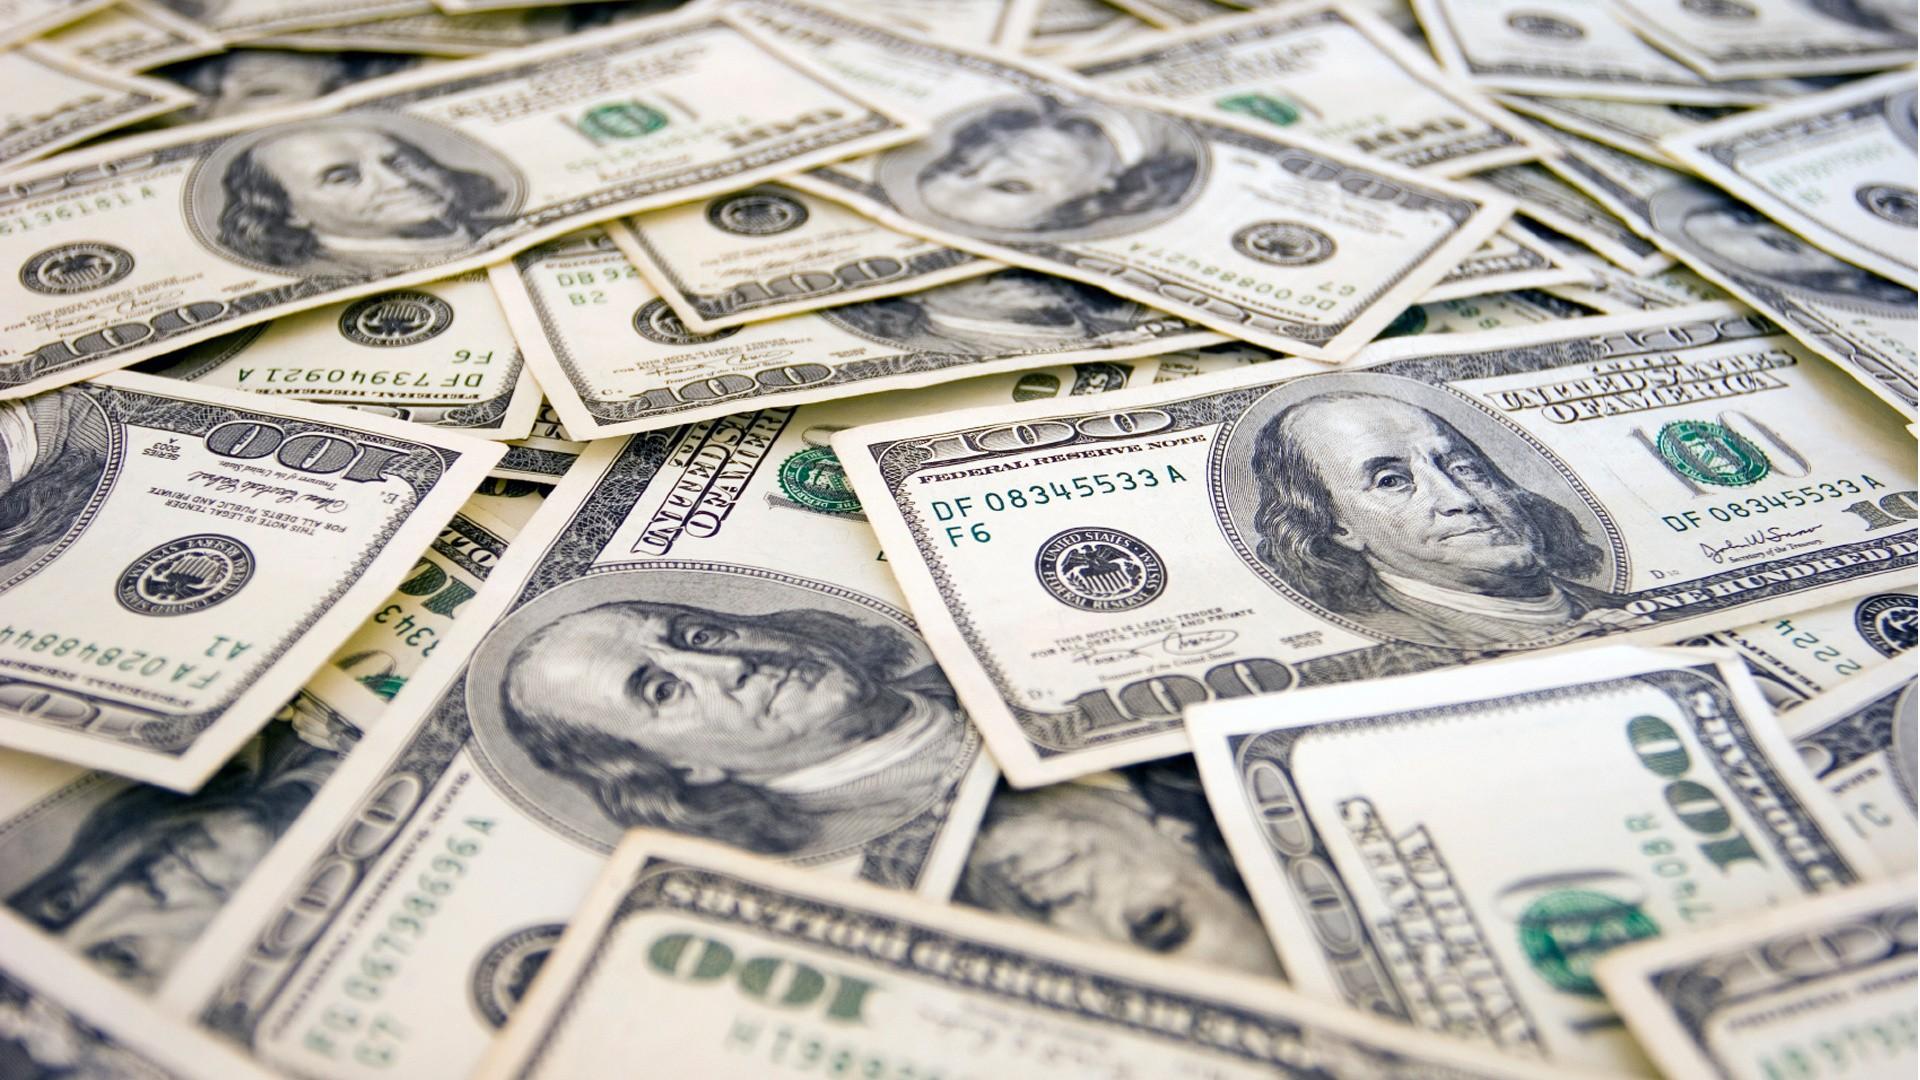 Dotace z rozpočtu Kohoutovic na rok 2018